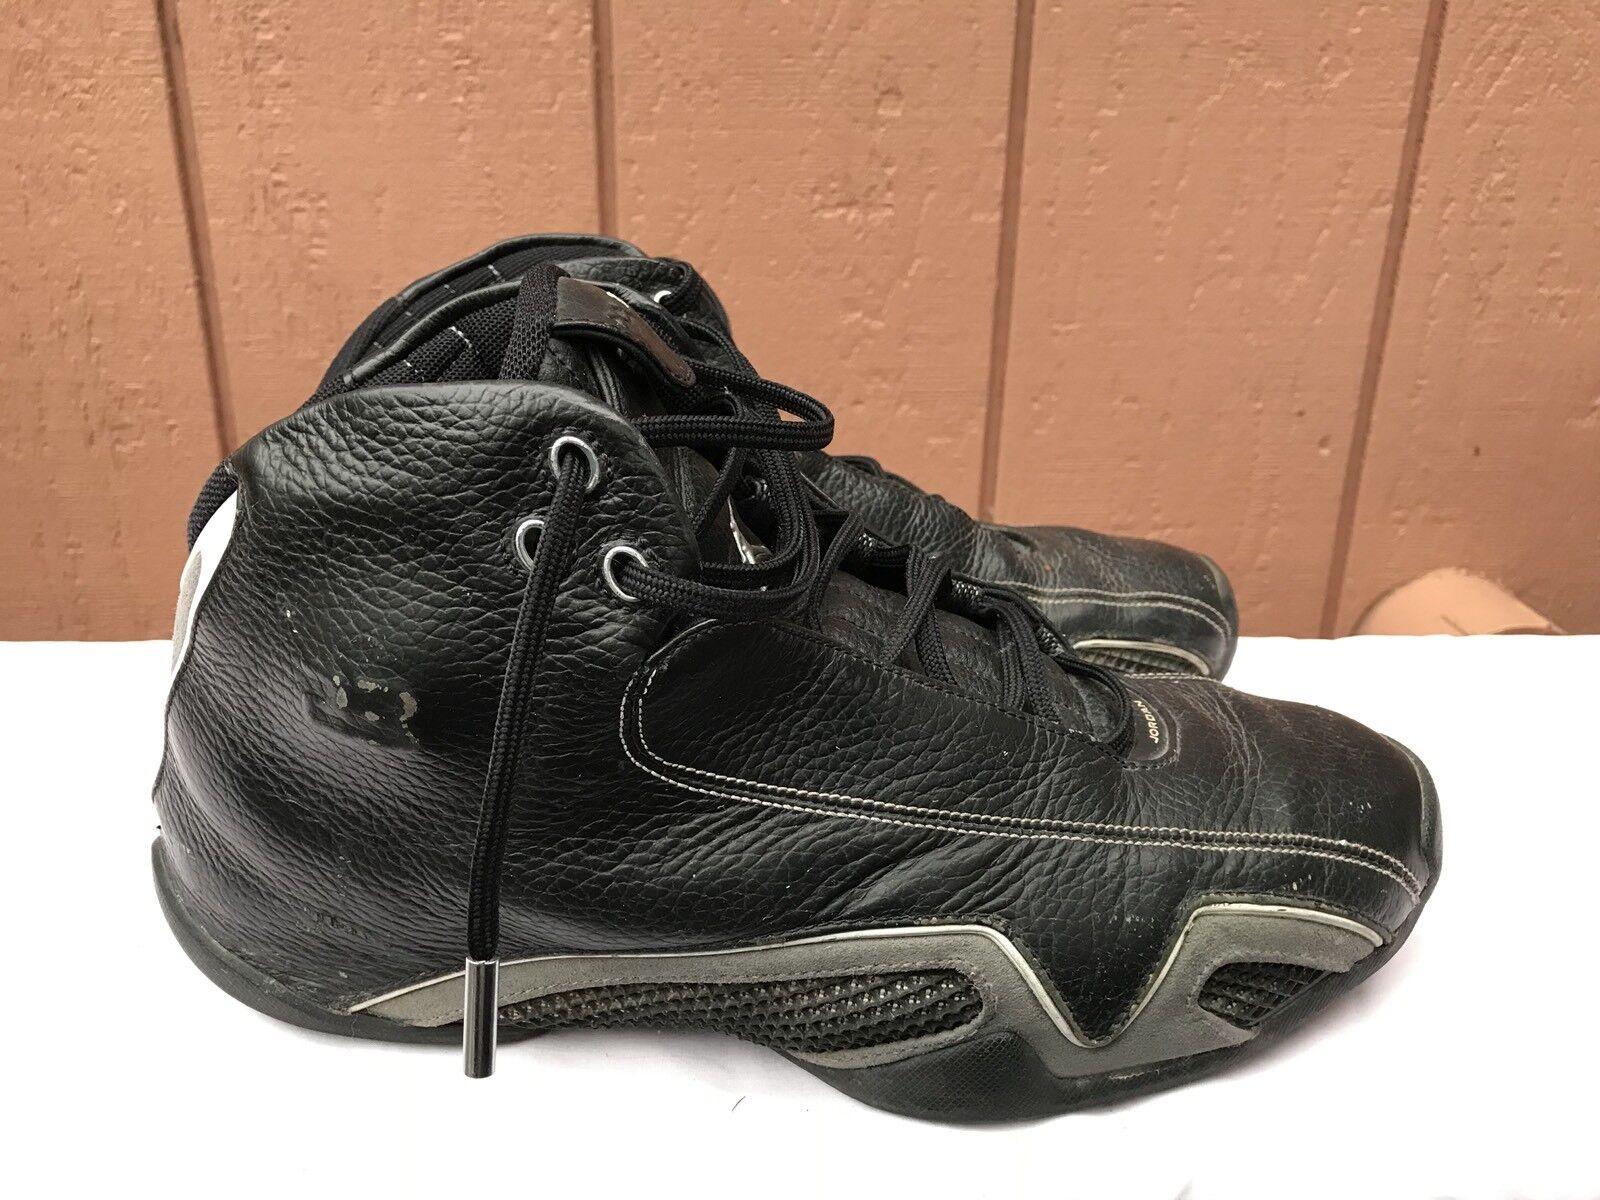 Cheap and beautiful fashion DS Nike Air Jordan XXI 21 OG AJ21 313511 001 Comfortable